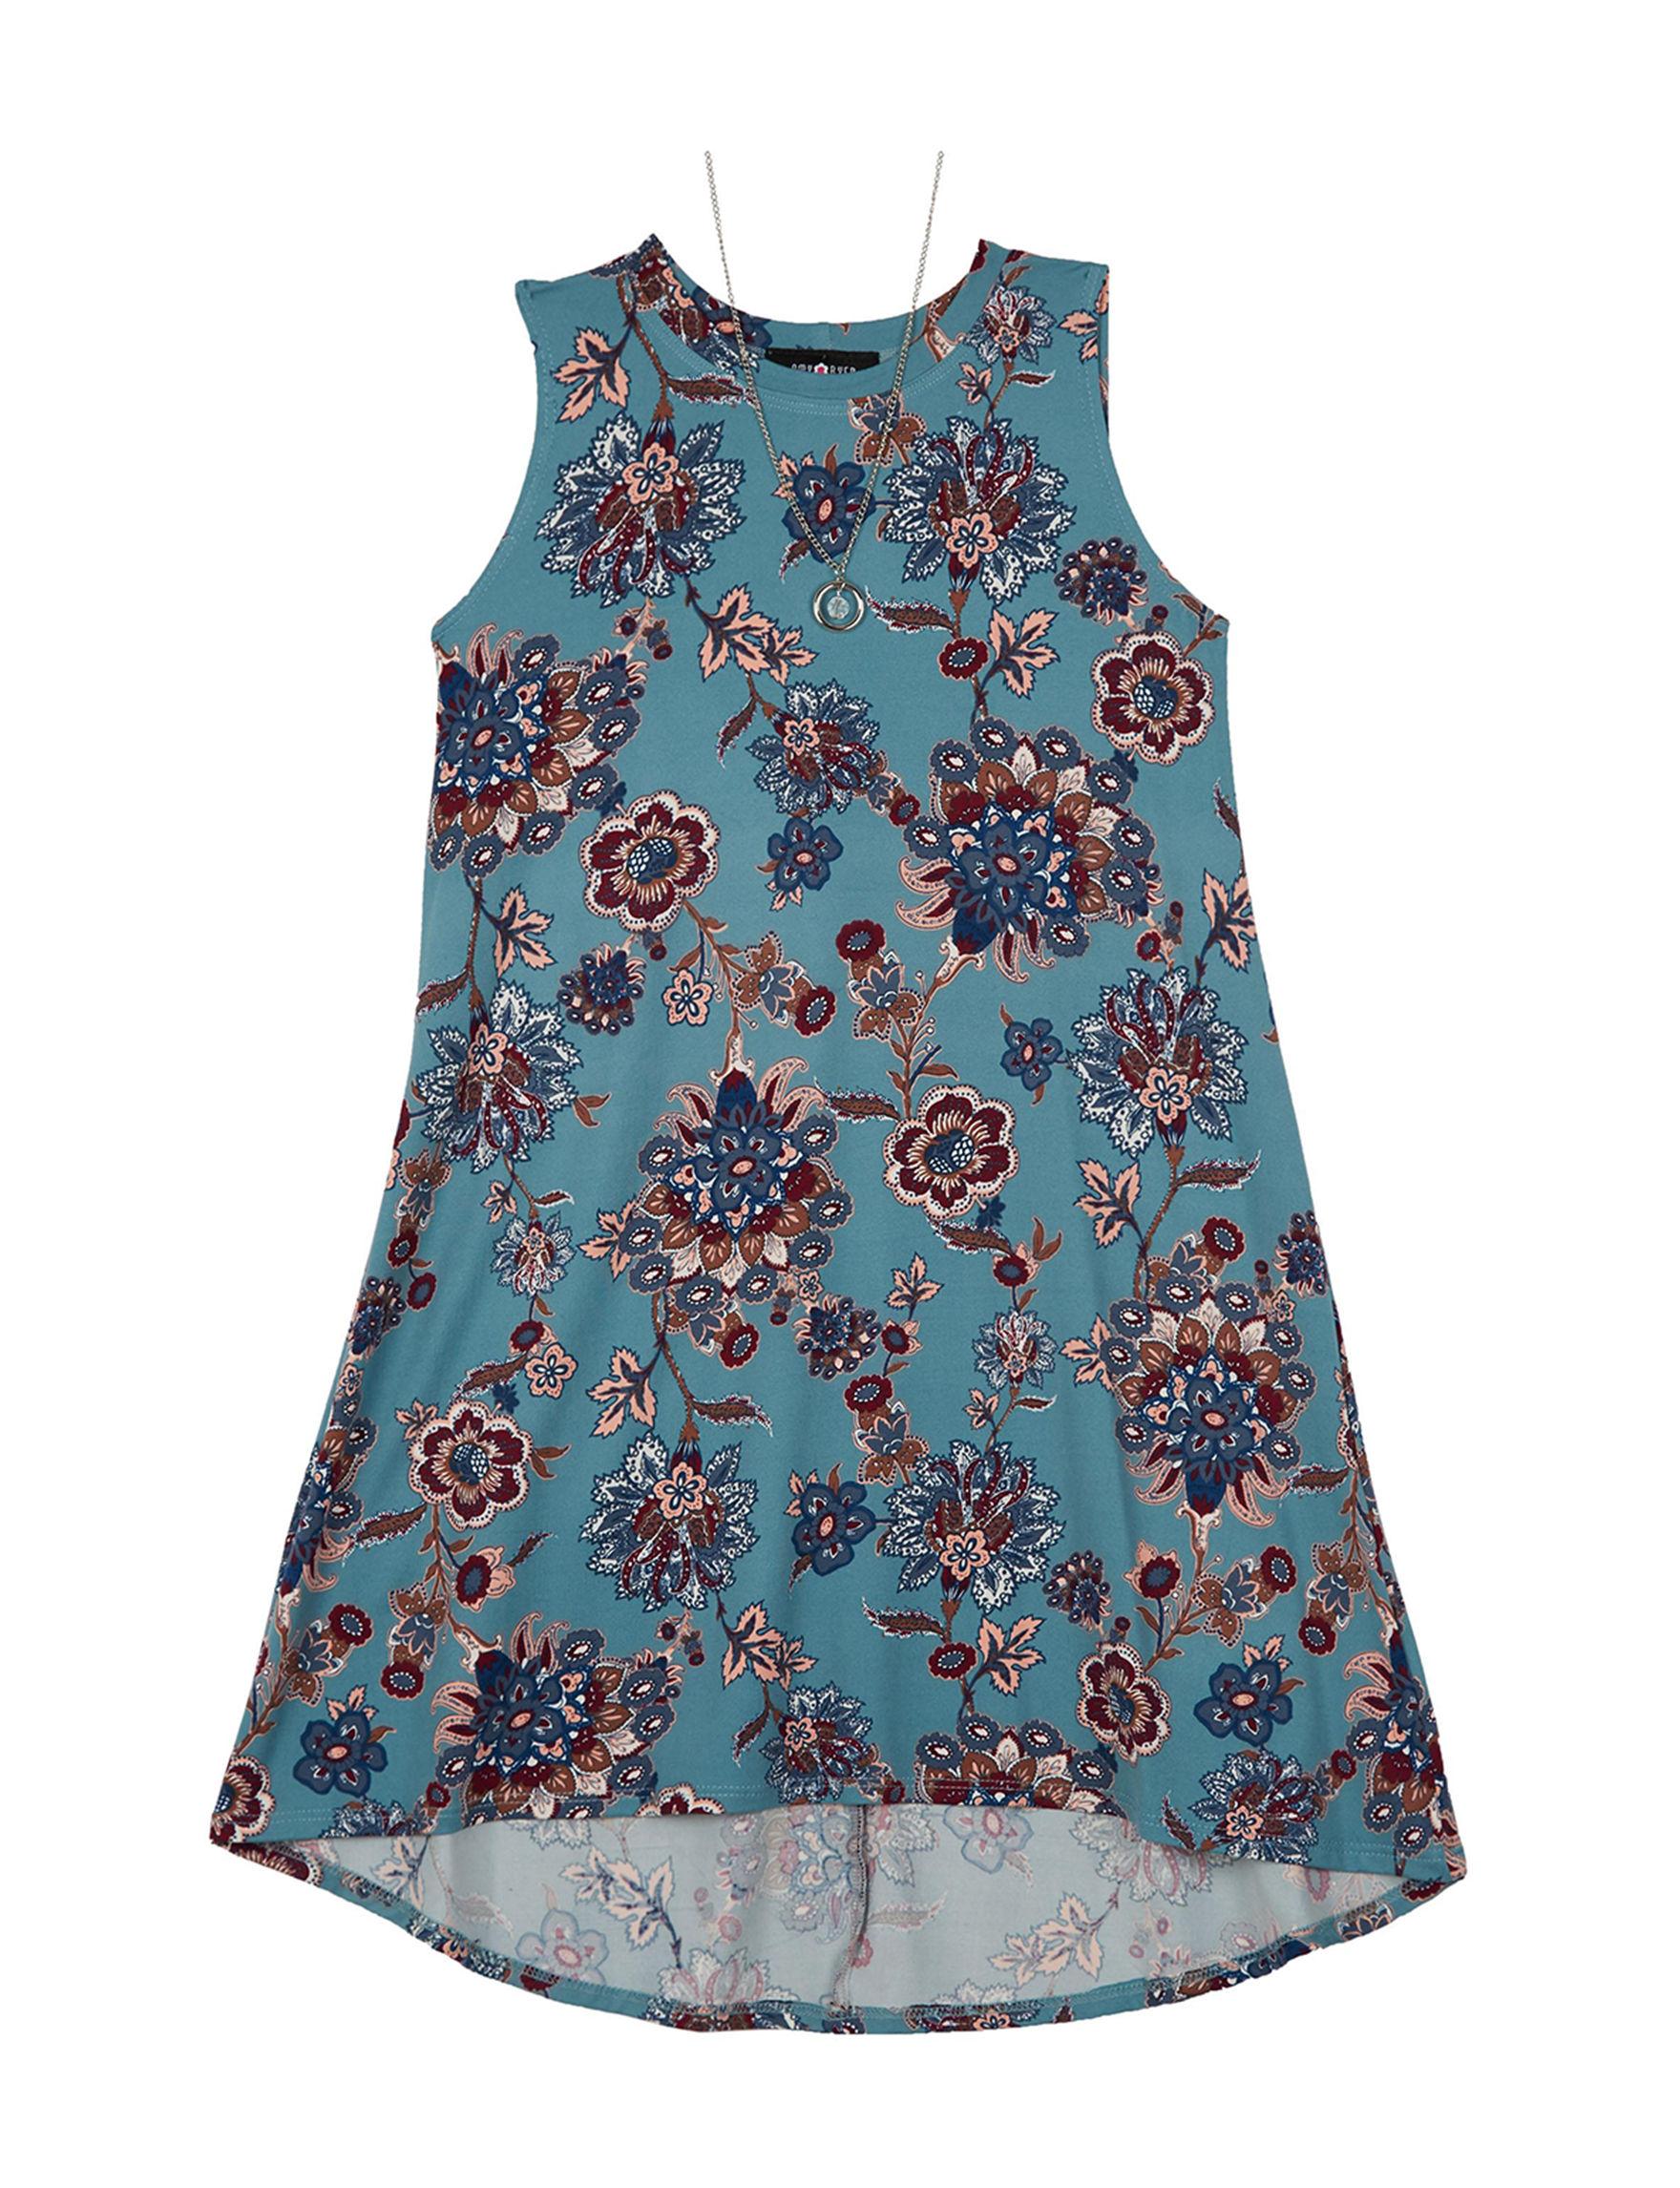 A. Byer Blue Floral